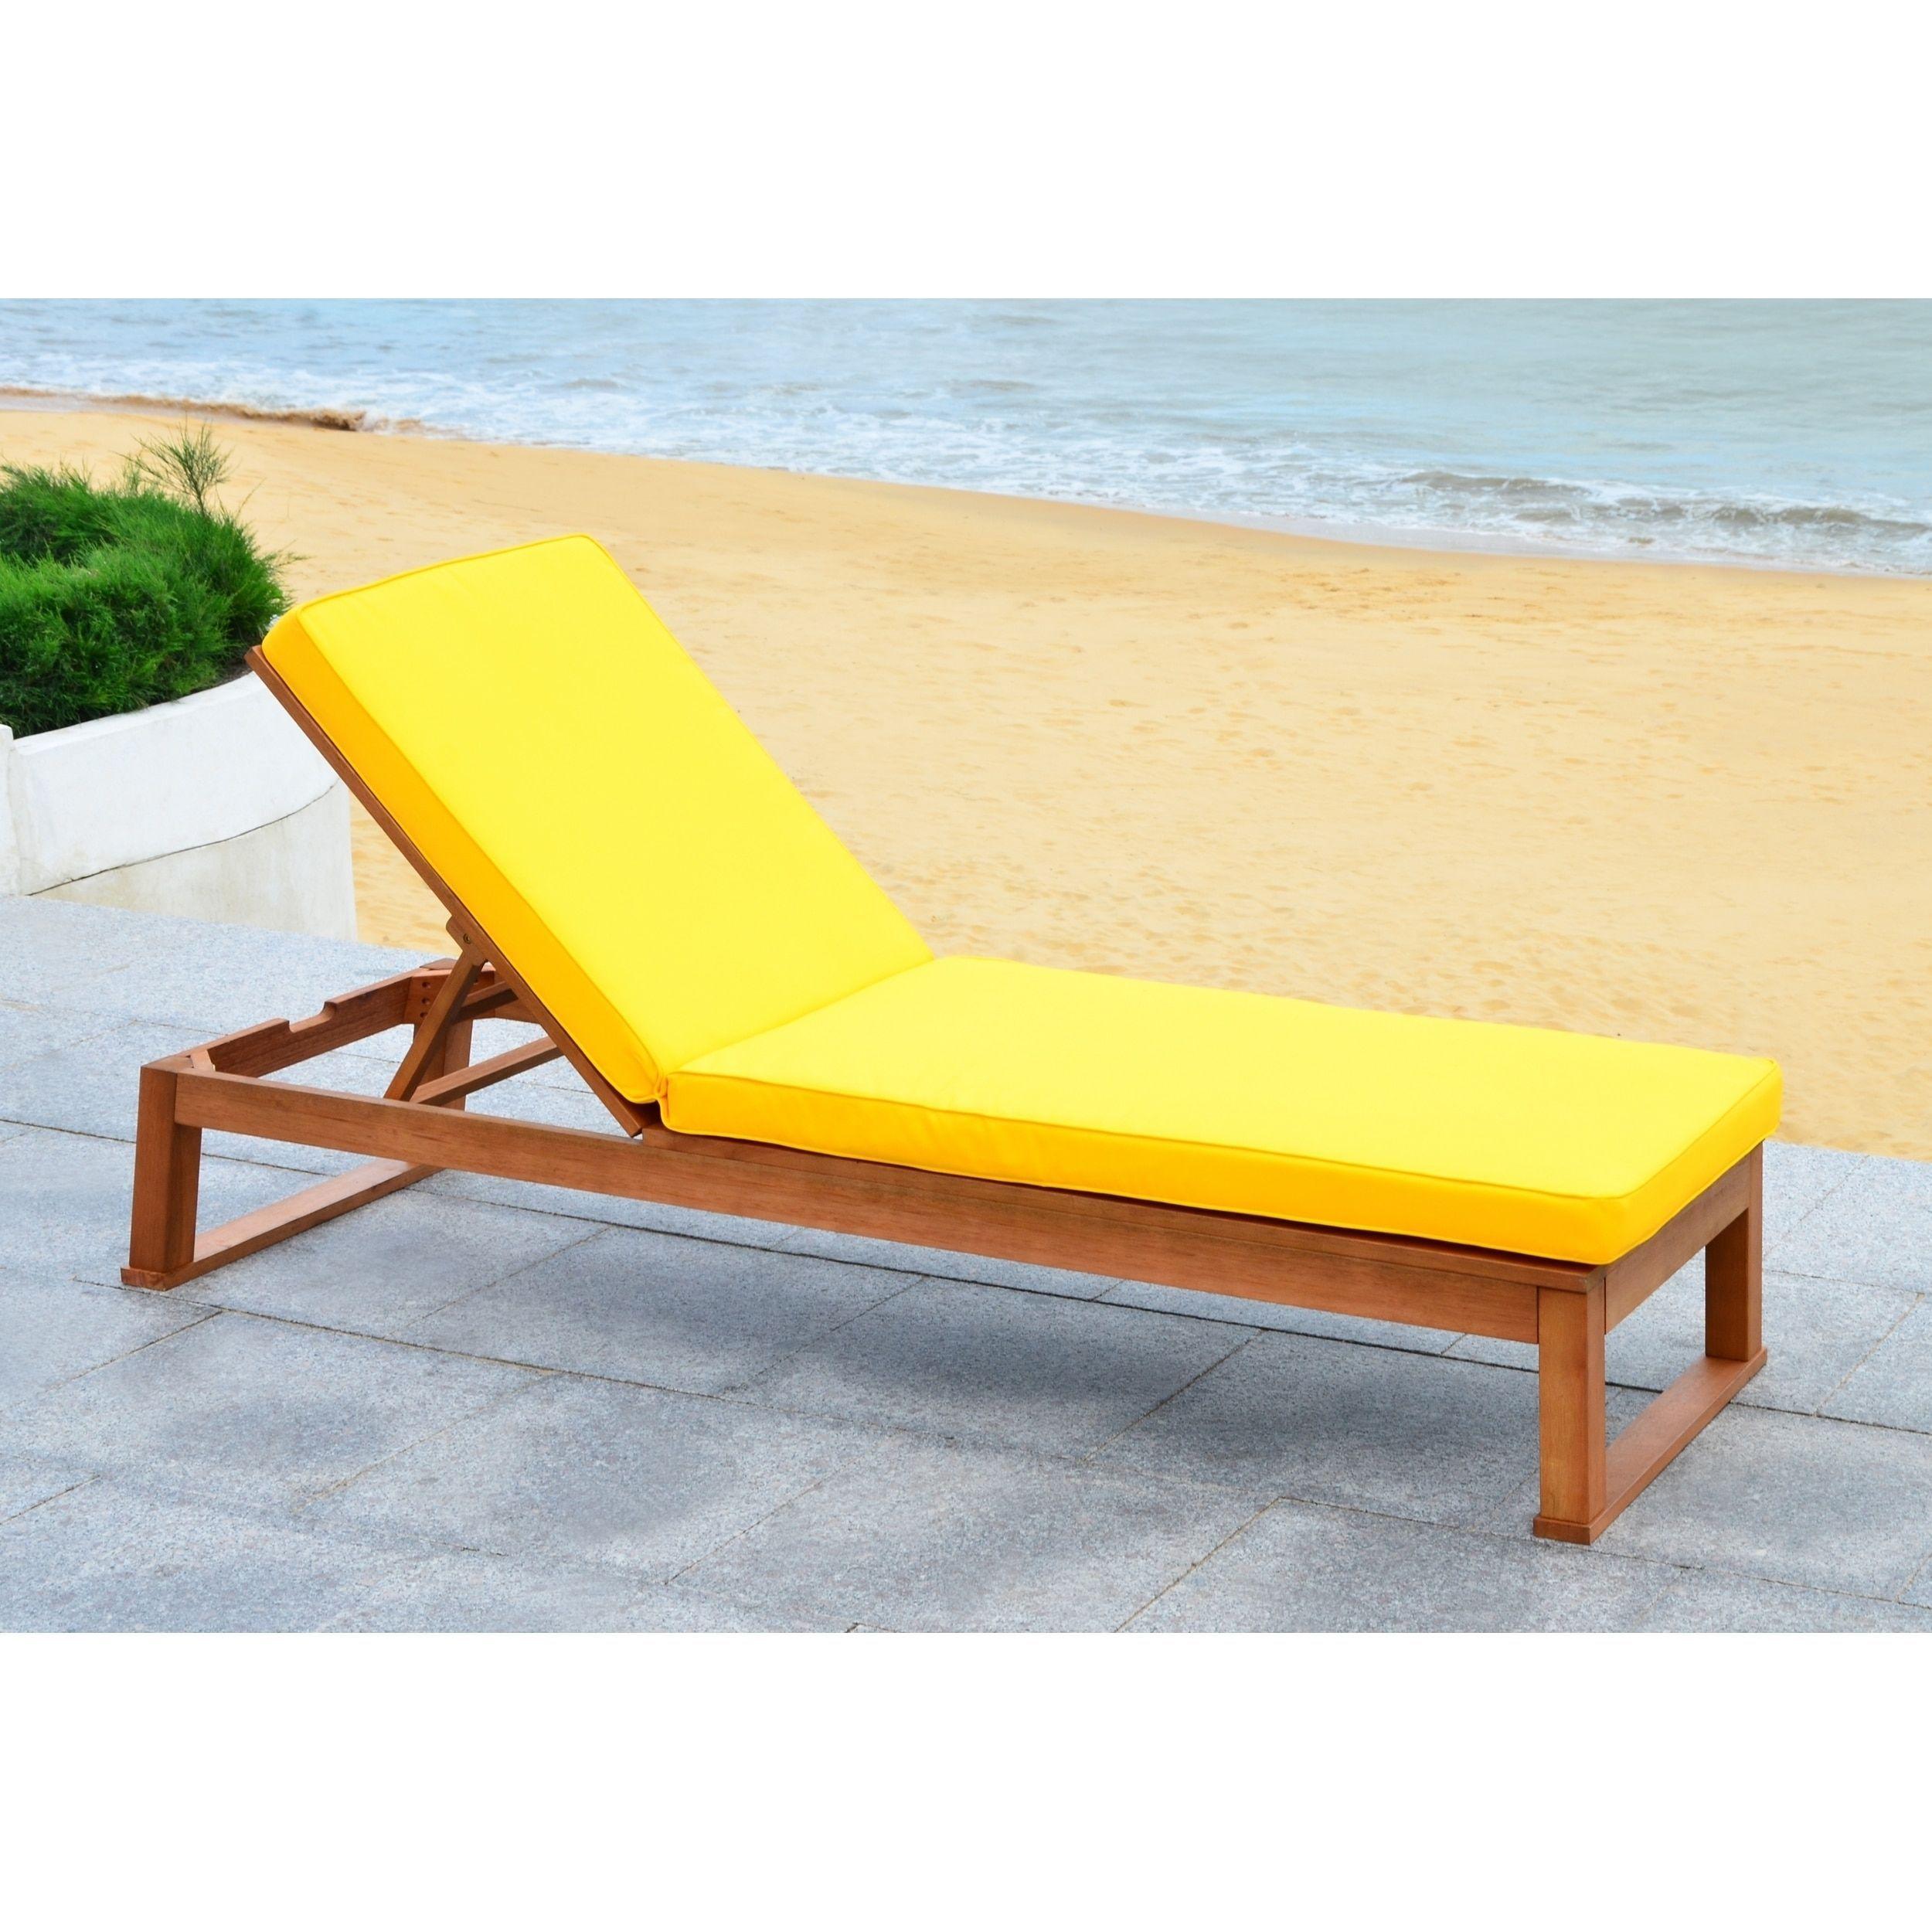 Safavieh Outdoor Living Solano Brown/ Yellow Sunlounger ... on Safavieh Outdoor Living Solano Sunlounger id=67048